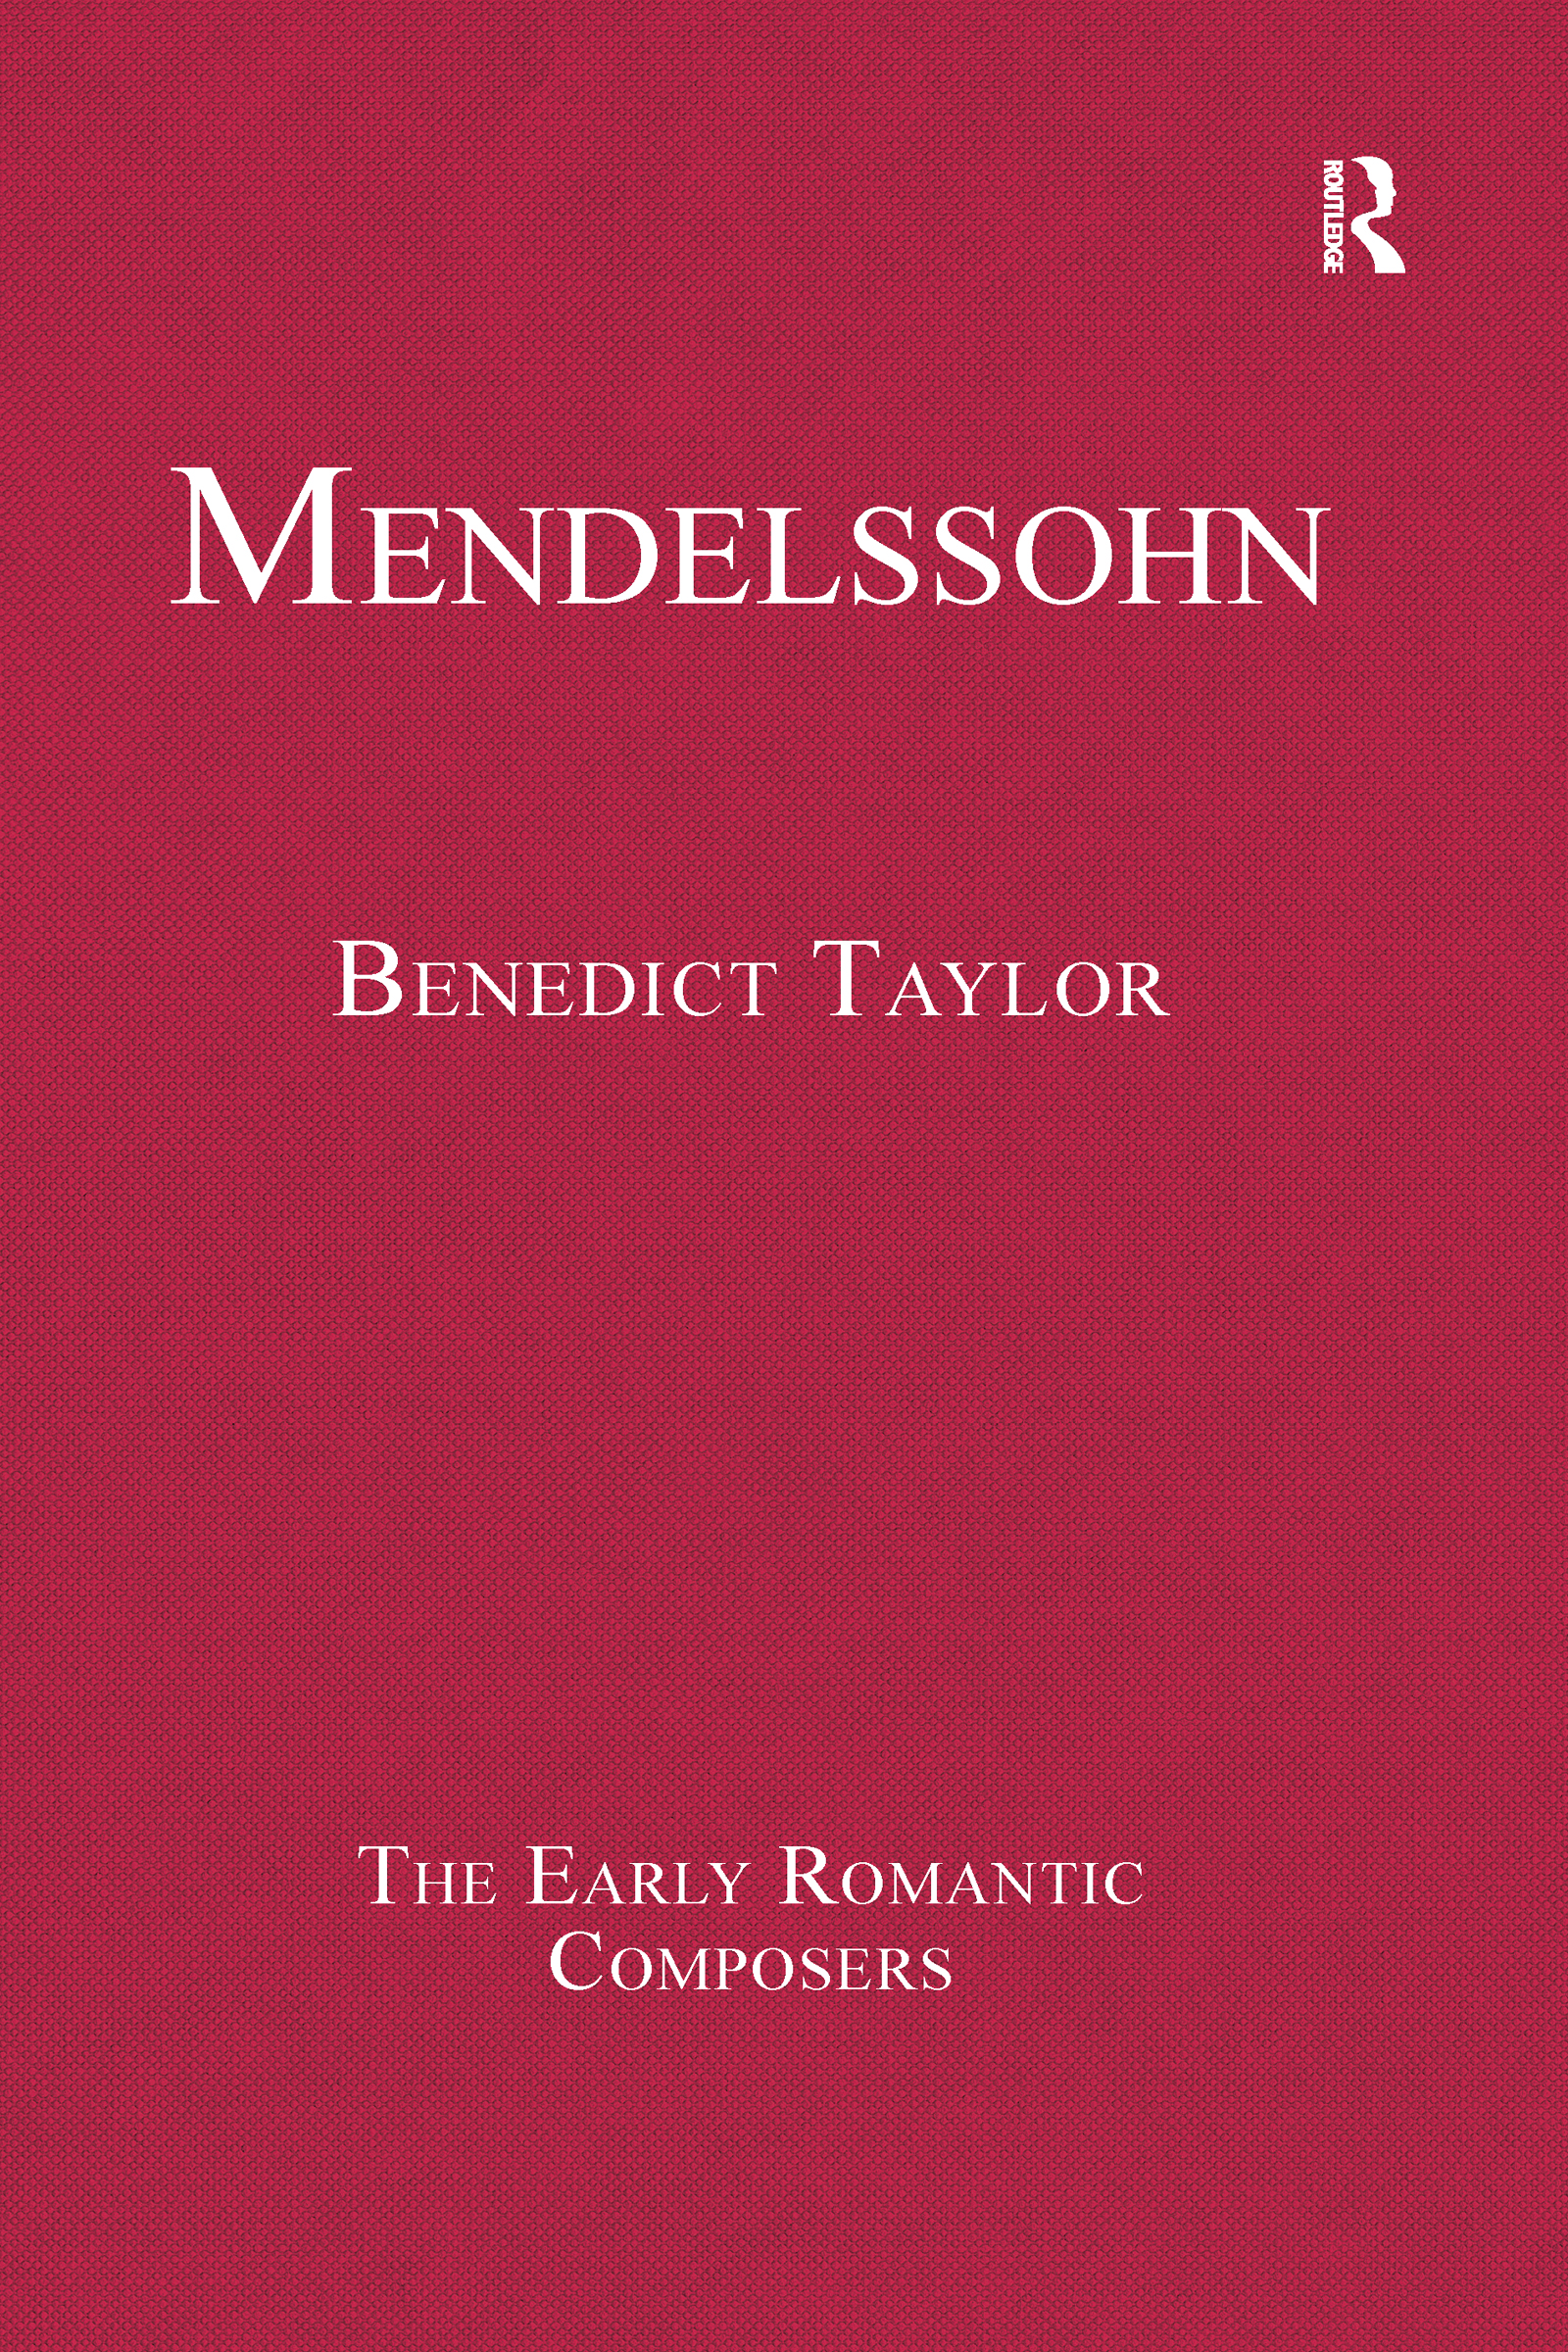 Creative Writing: The [Self-] Identification of Mendelssohn as Jew